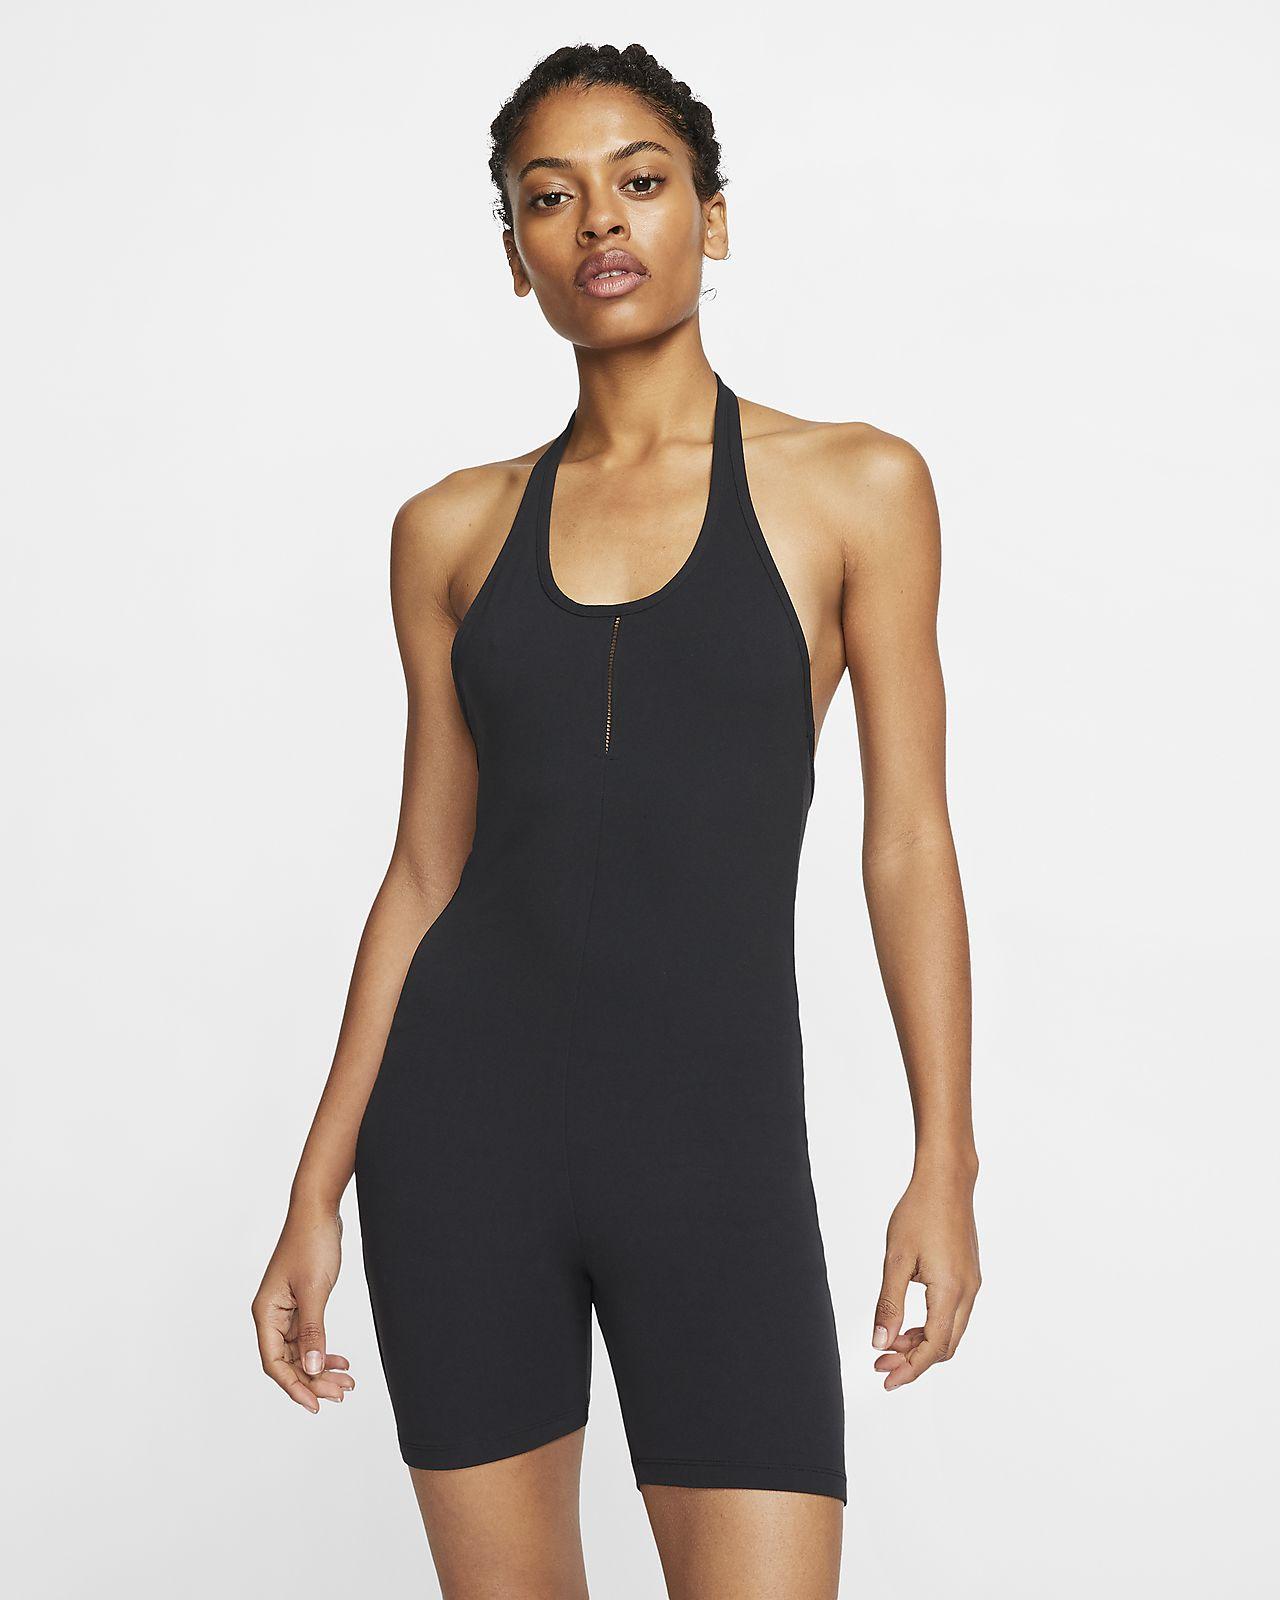 Nike Yoga Luxe Women's Infinalon Jumpsuit